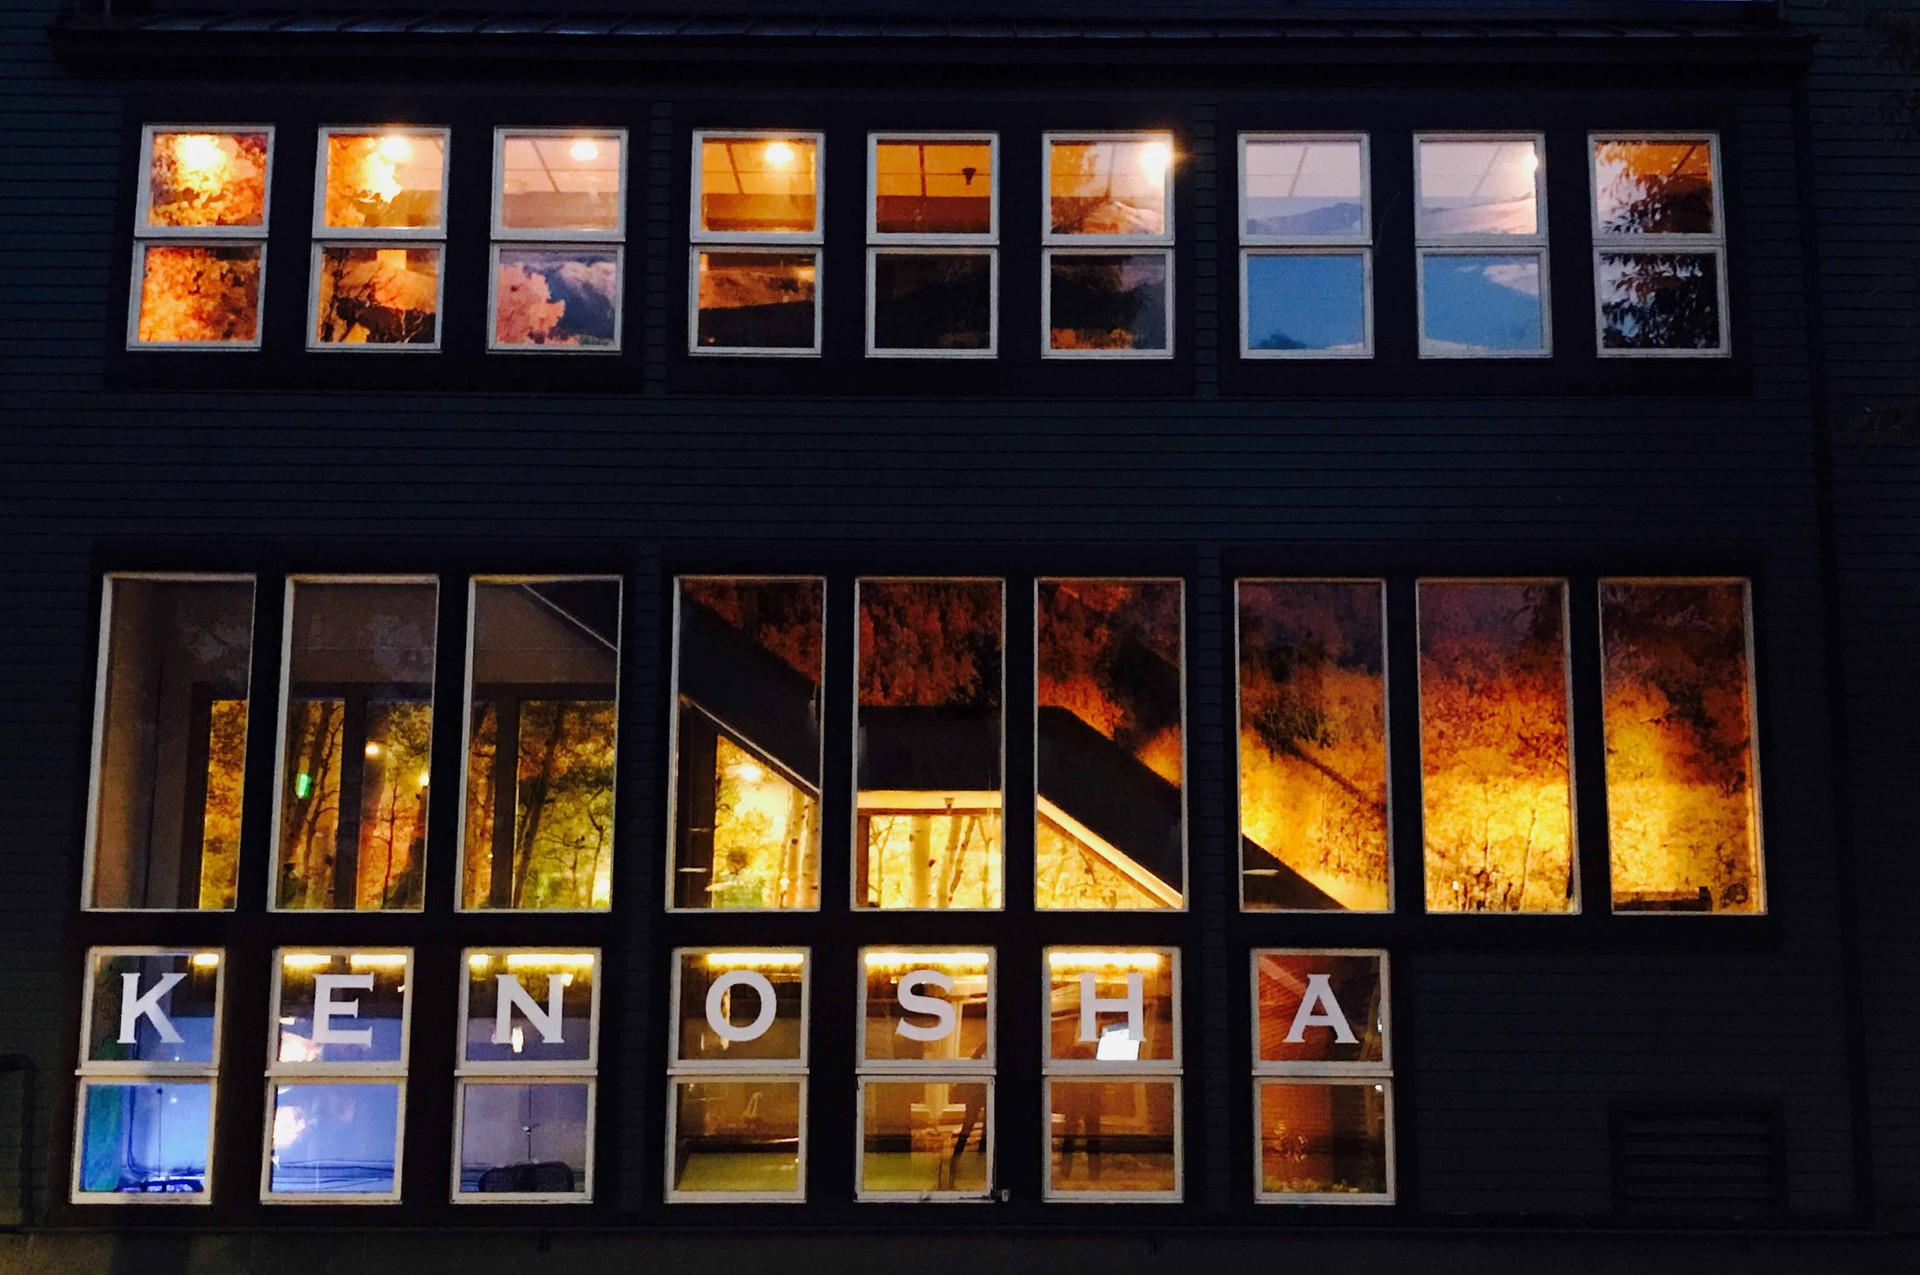 Kenosha Outside At Night.JPG